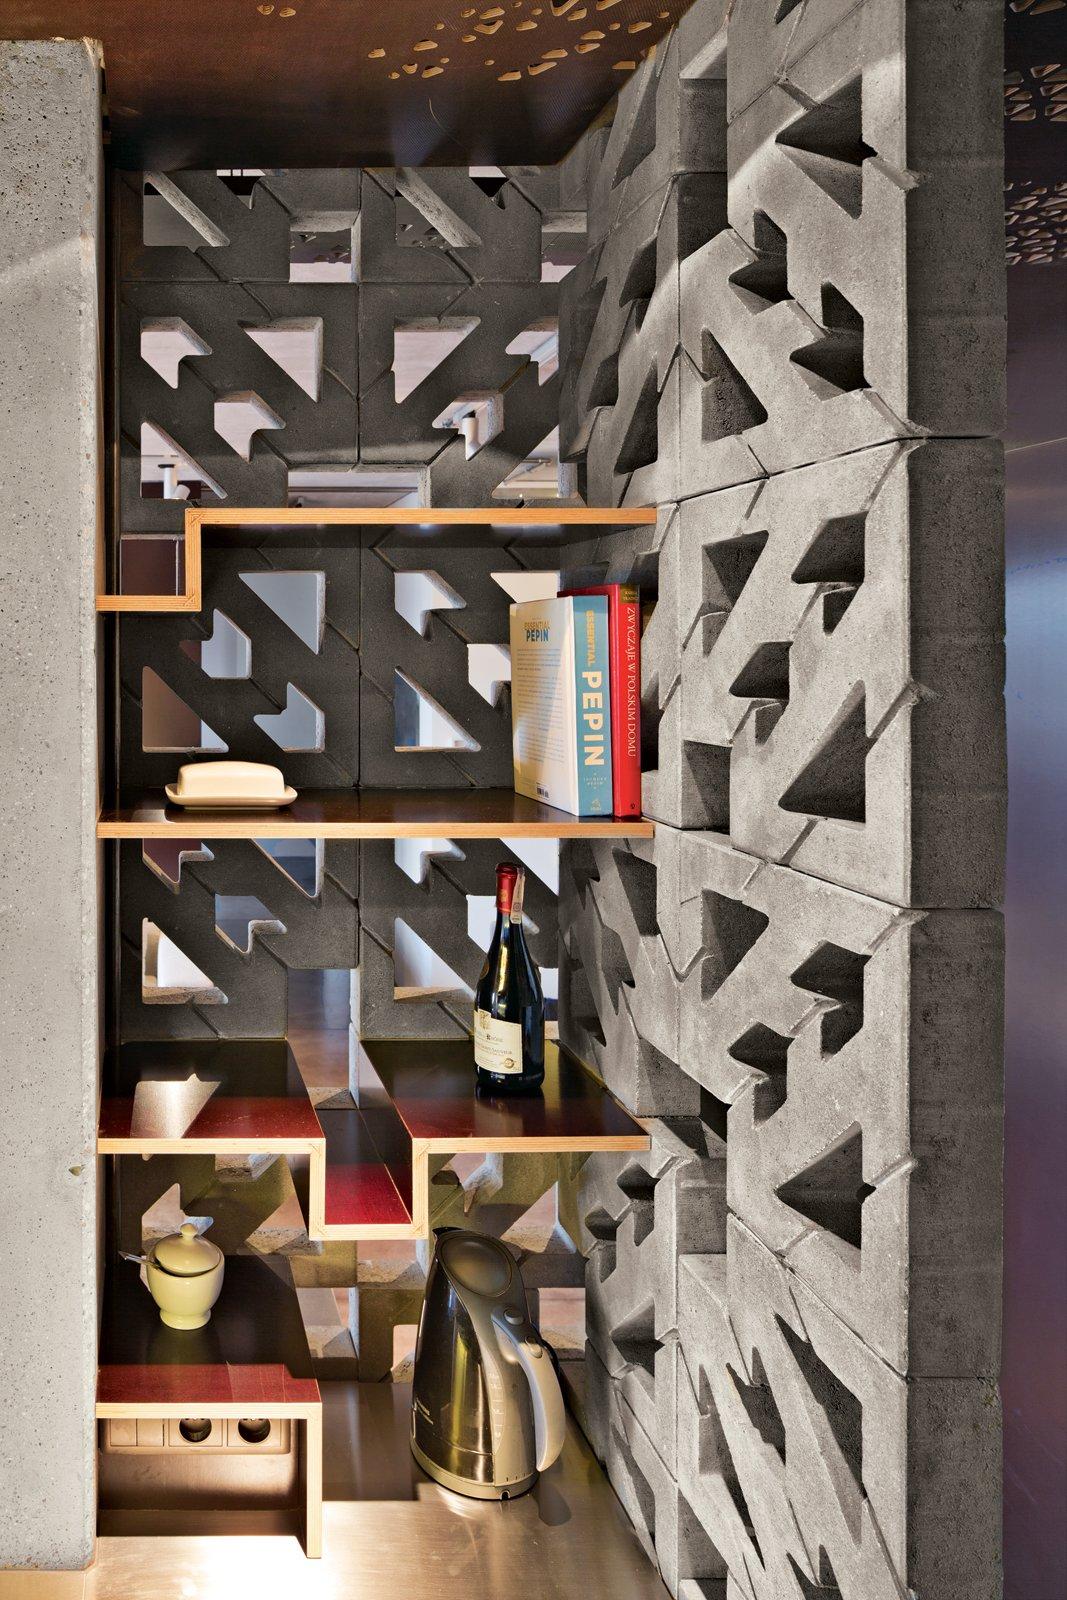 Nix and Novak-Zemplinski designed the black-steel bookshelves and had them fabricated at a local metal shop.